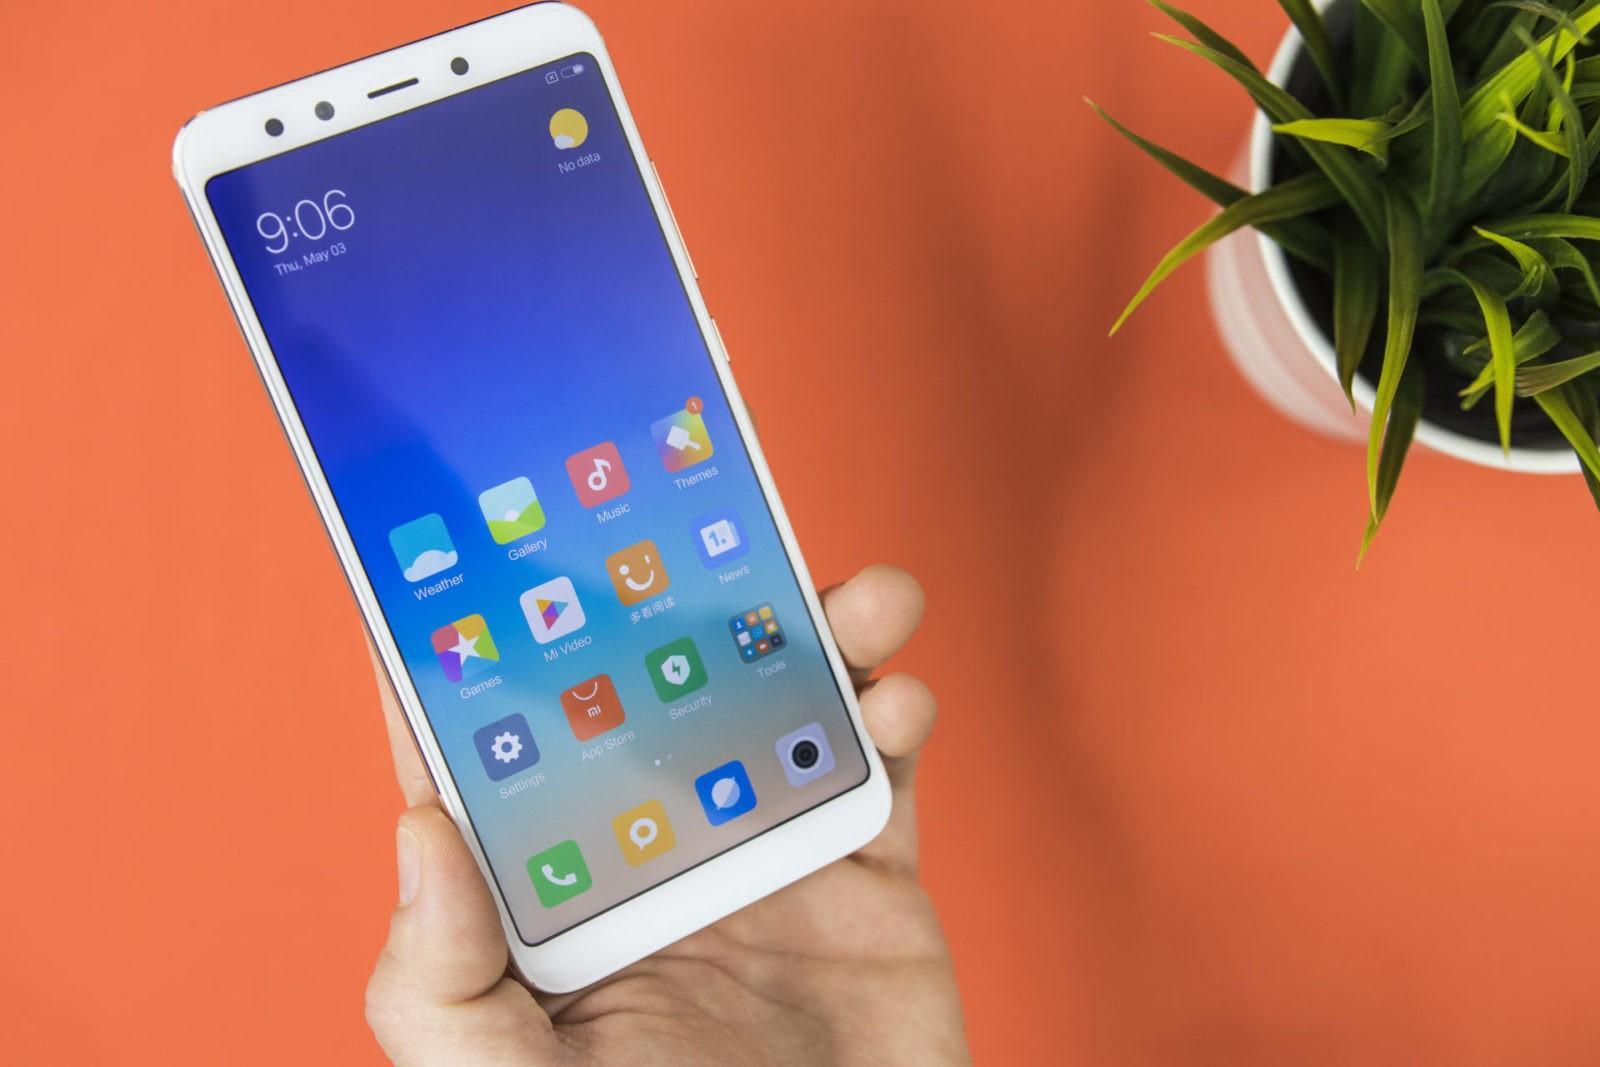 Unboxing del nuovo Xiaomi 6x